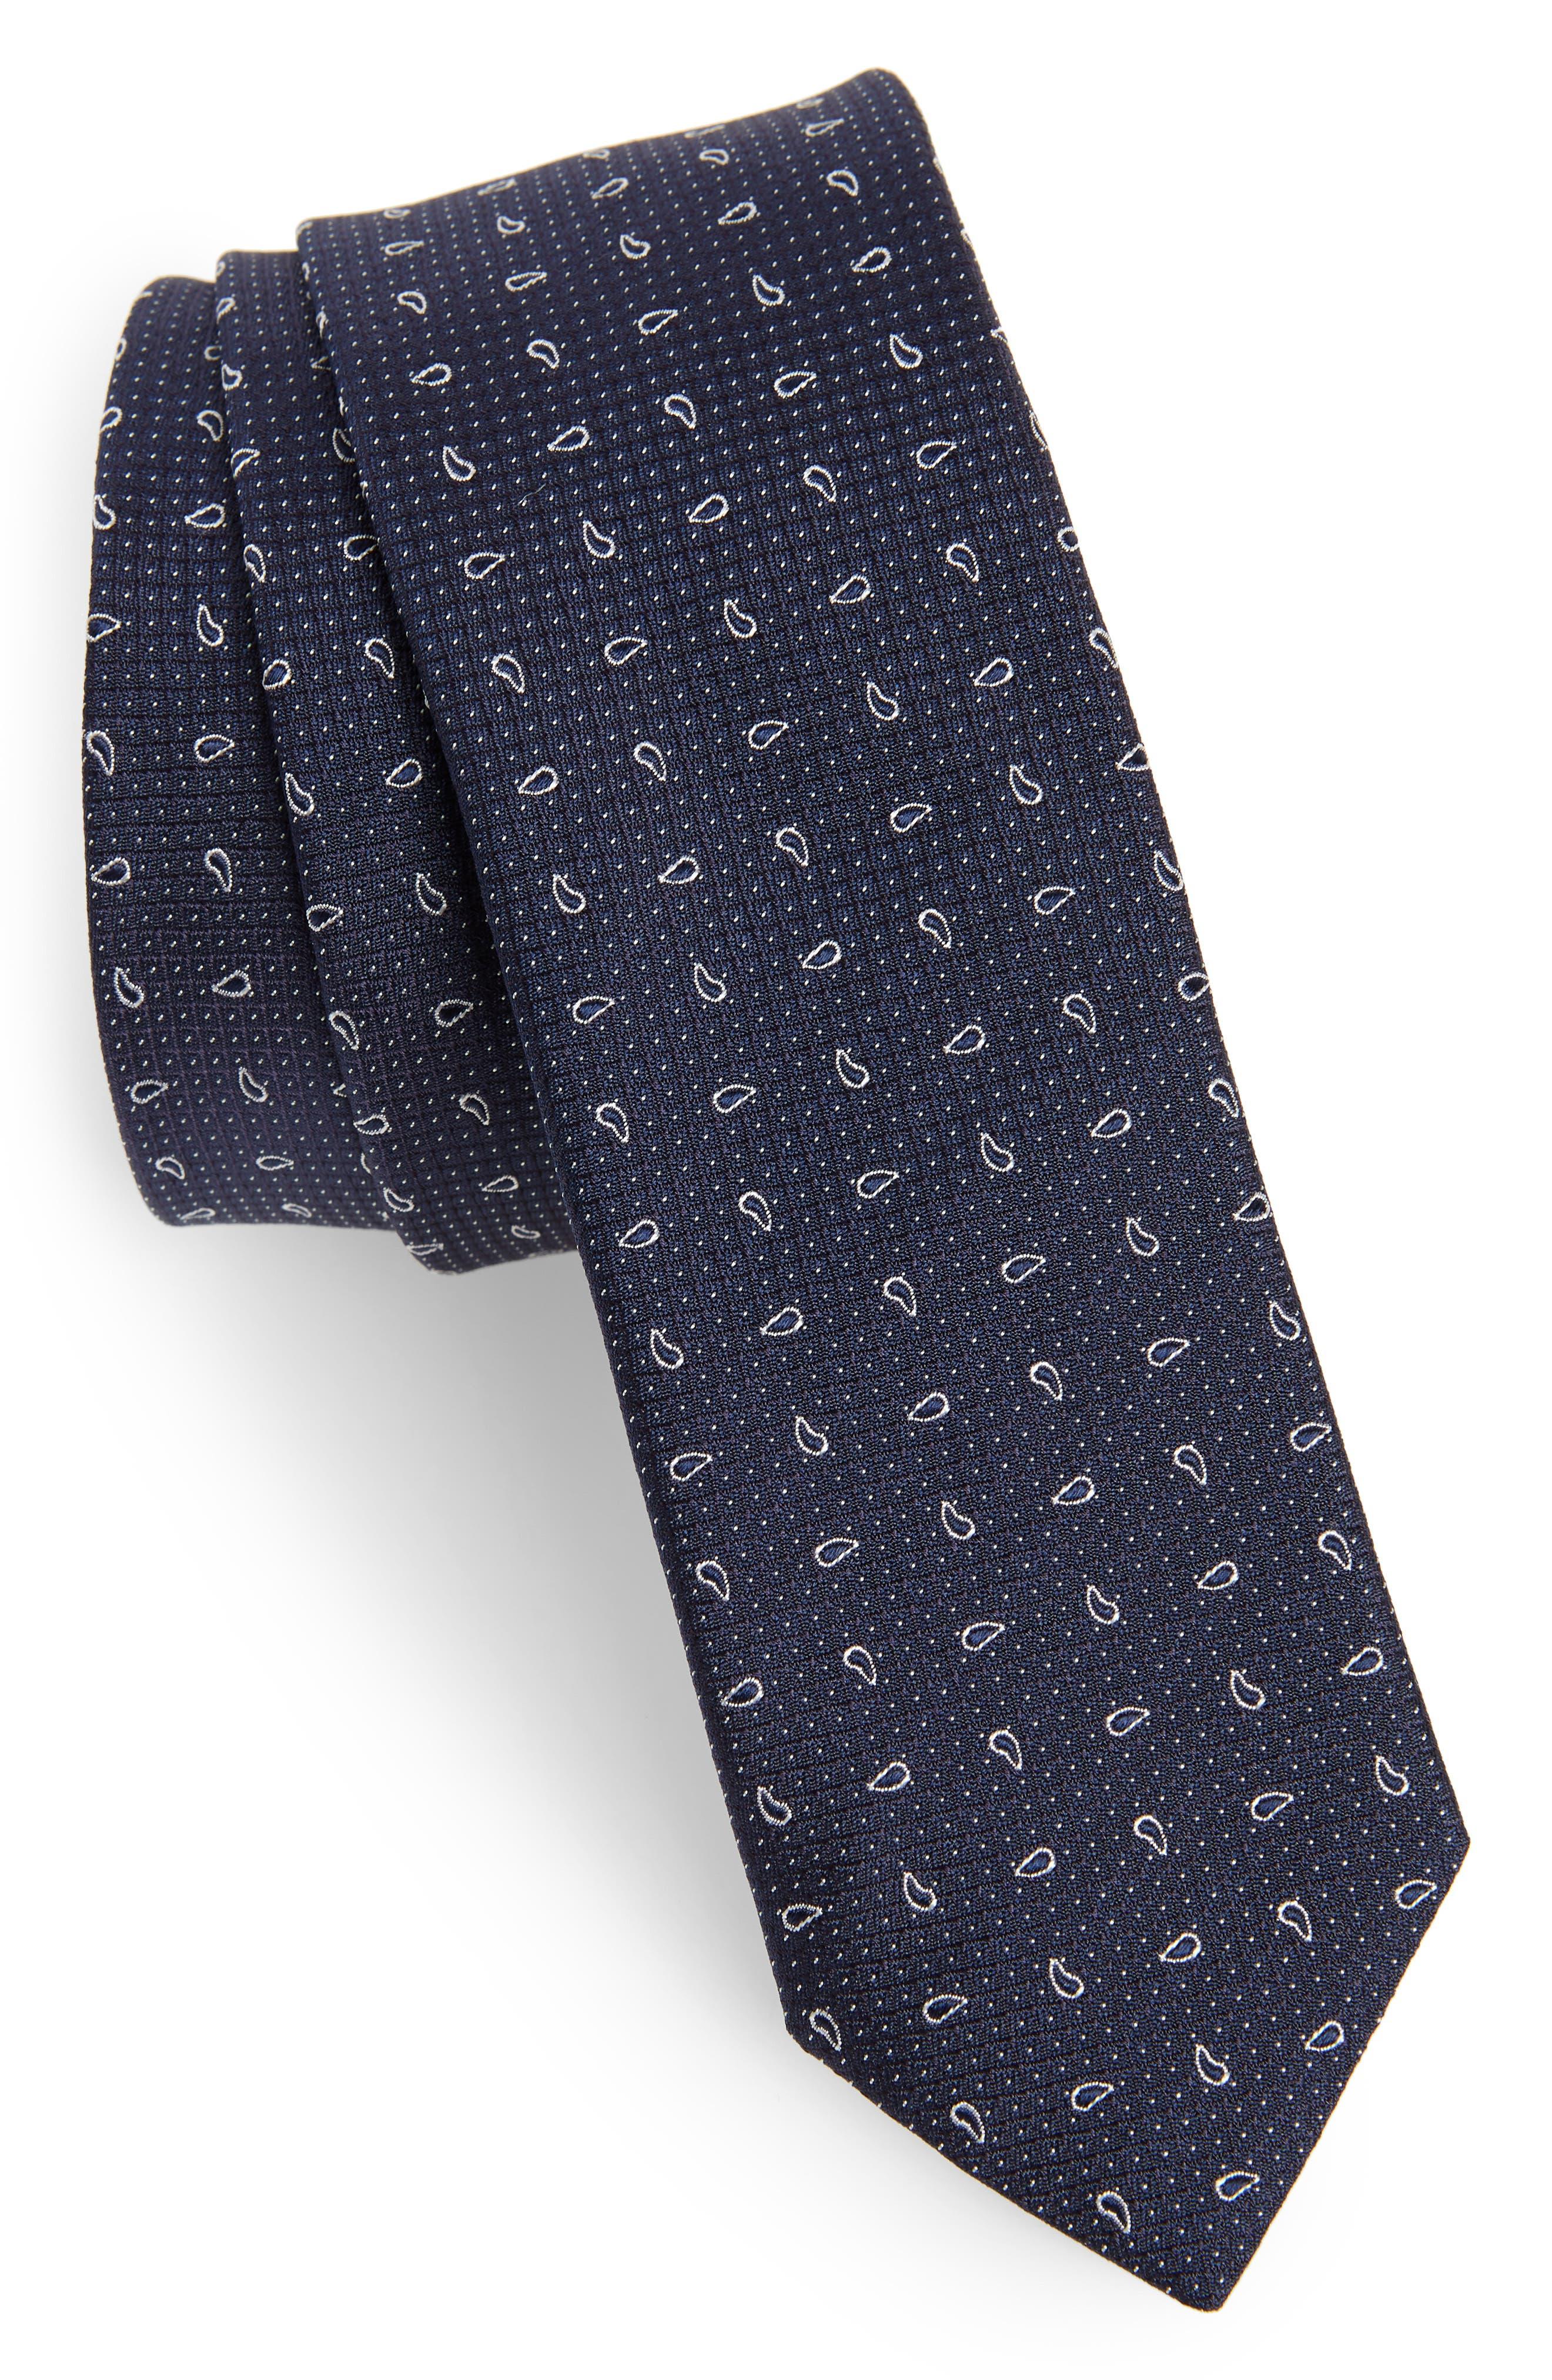 Paisley Silk Tie,                             Main thumbnail 1, color,                             NAVY BLUE